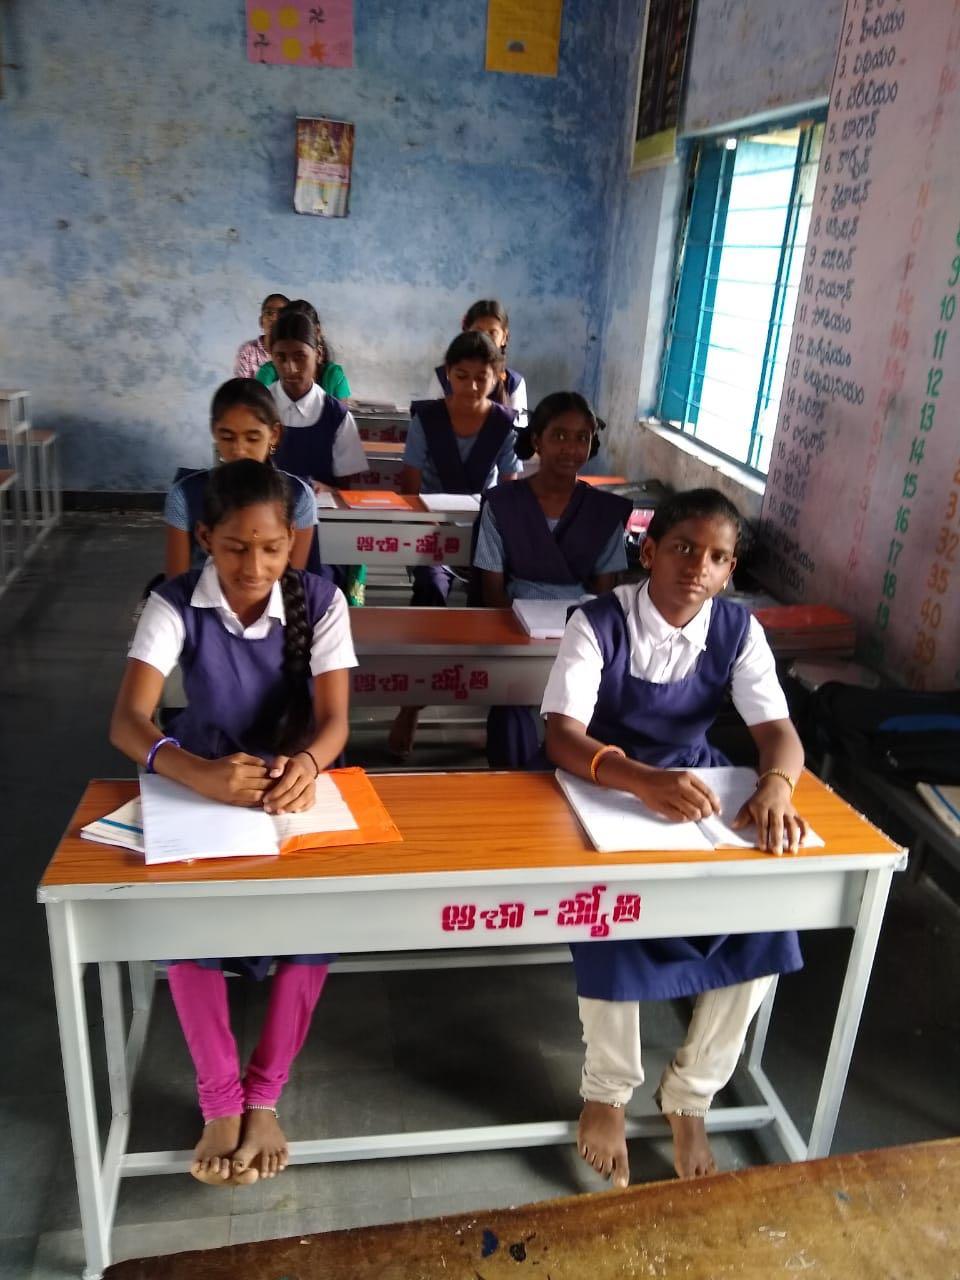 Benches and desks to school children